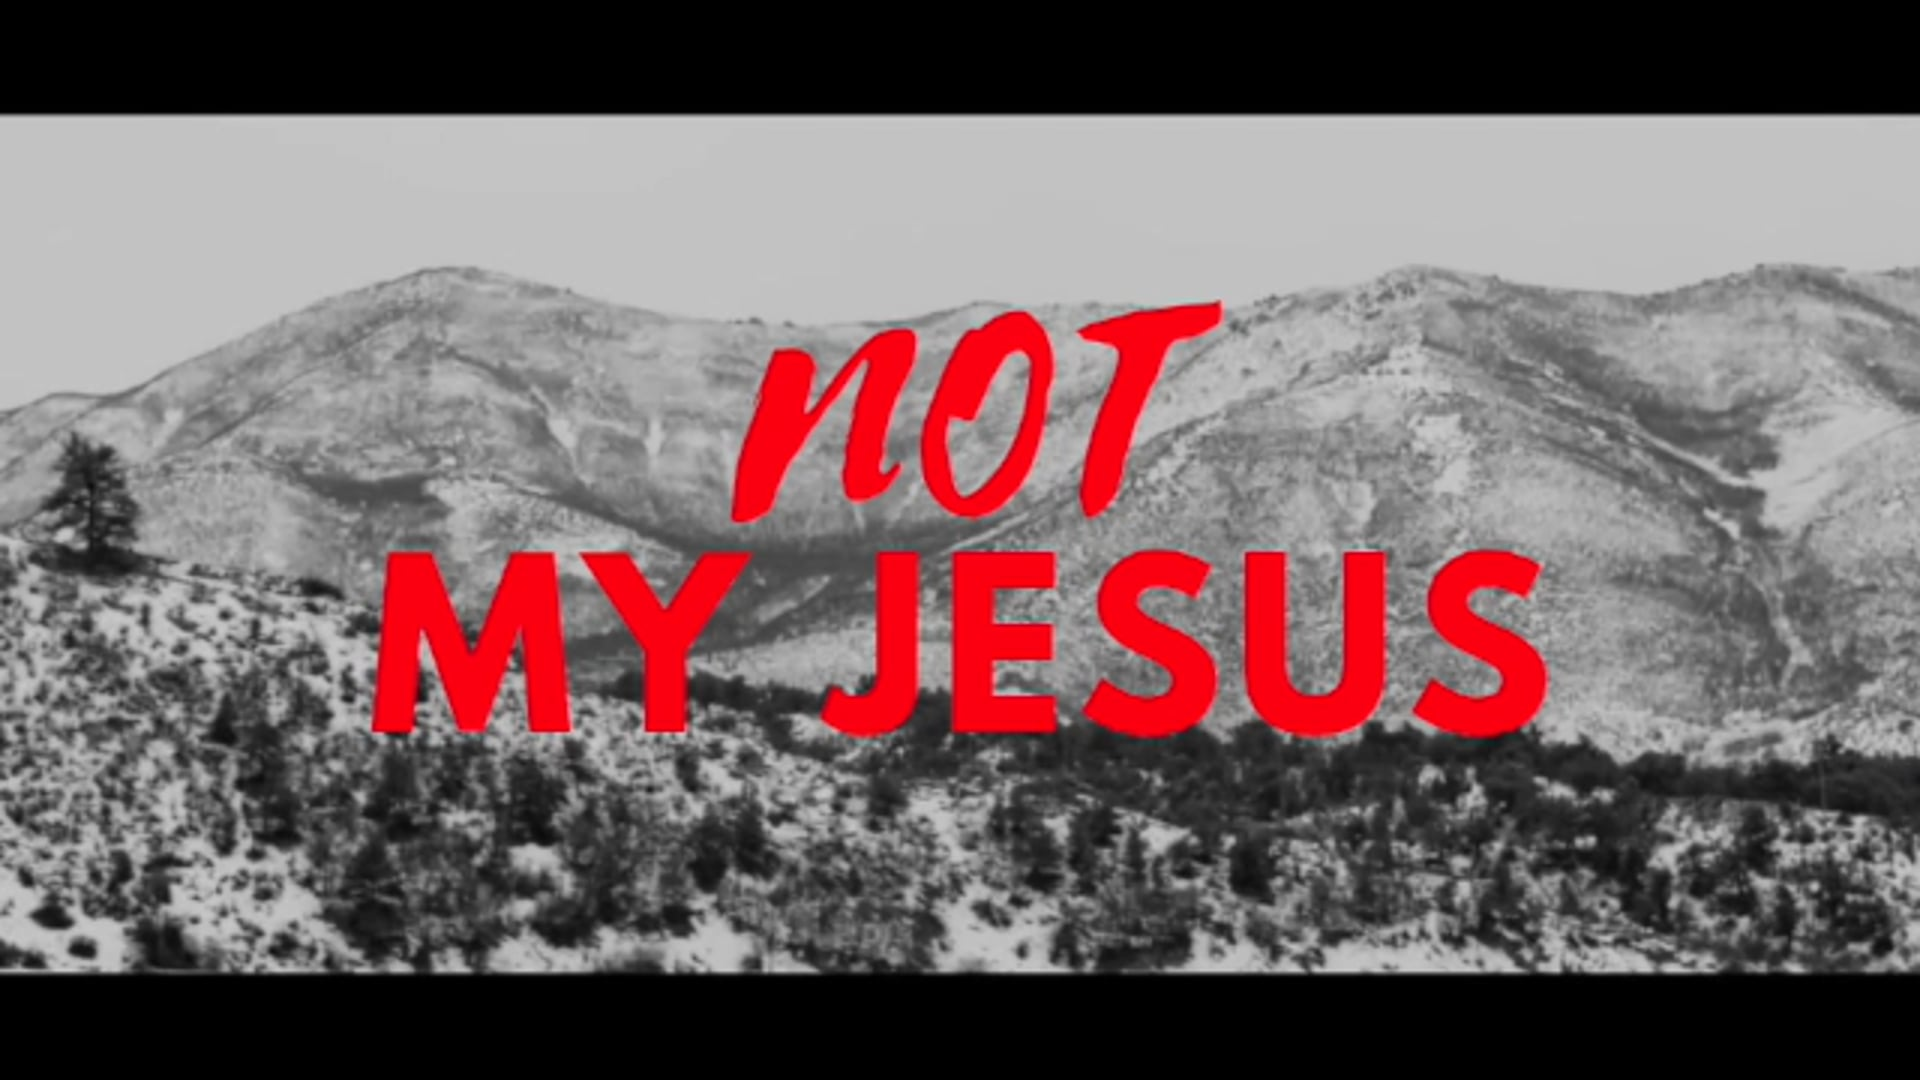 Immune to Jesus - January 6, 2019